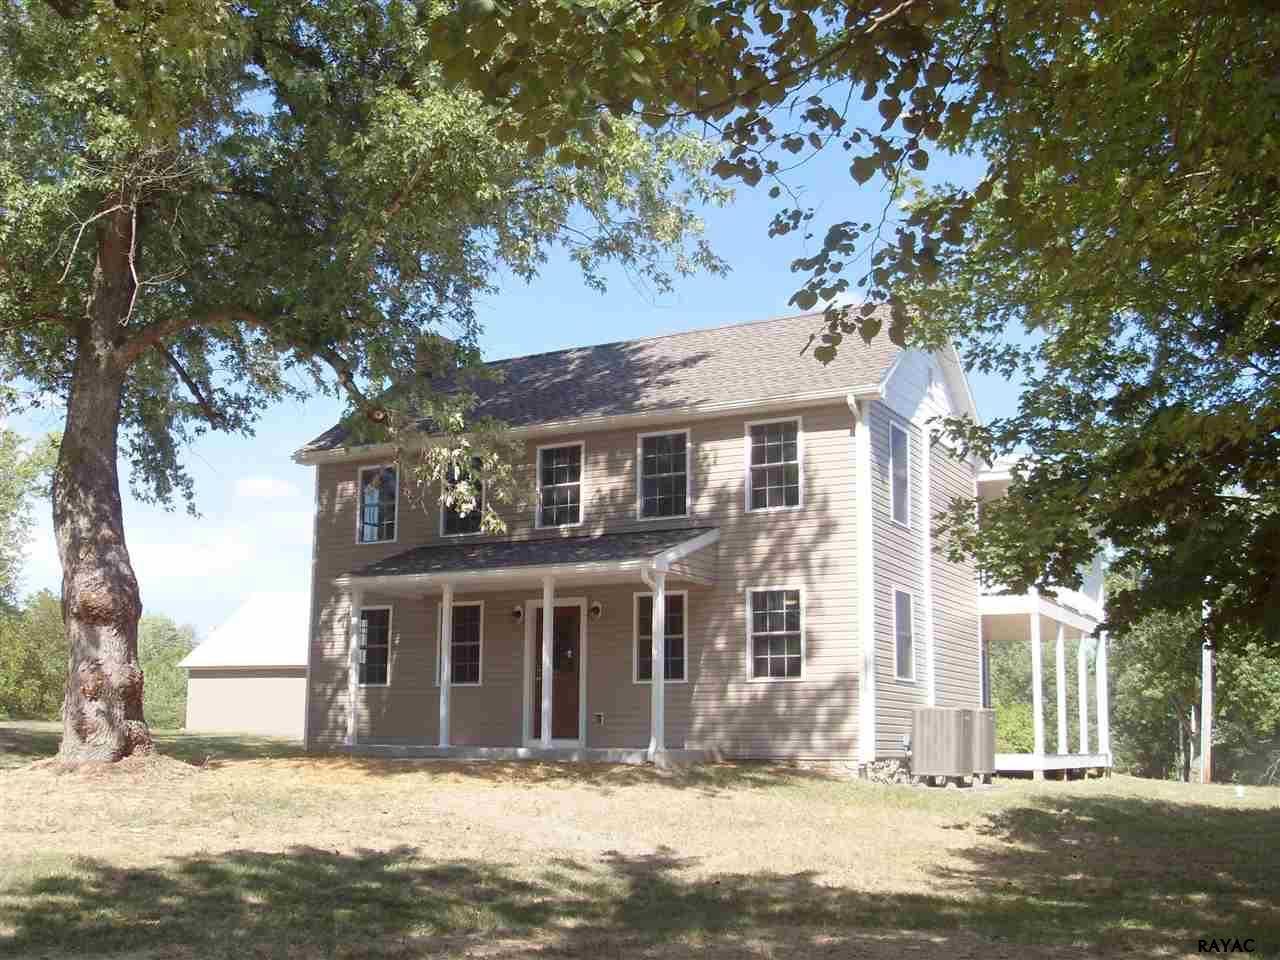 404 Shrivers Corner Rd, Gettysburg, PA 17325